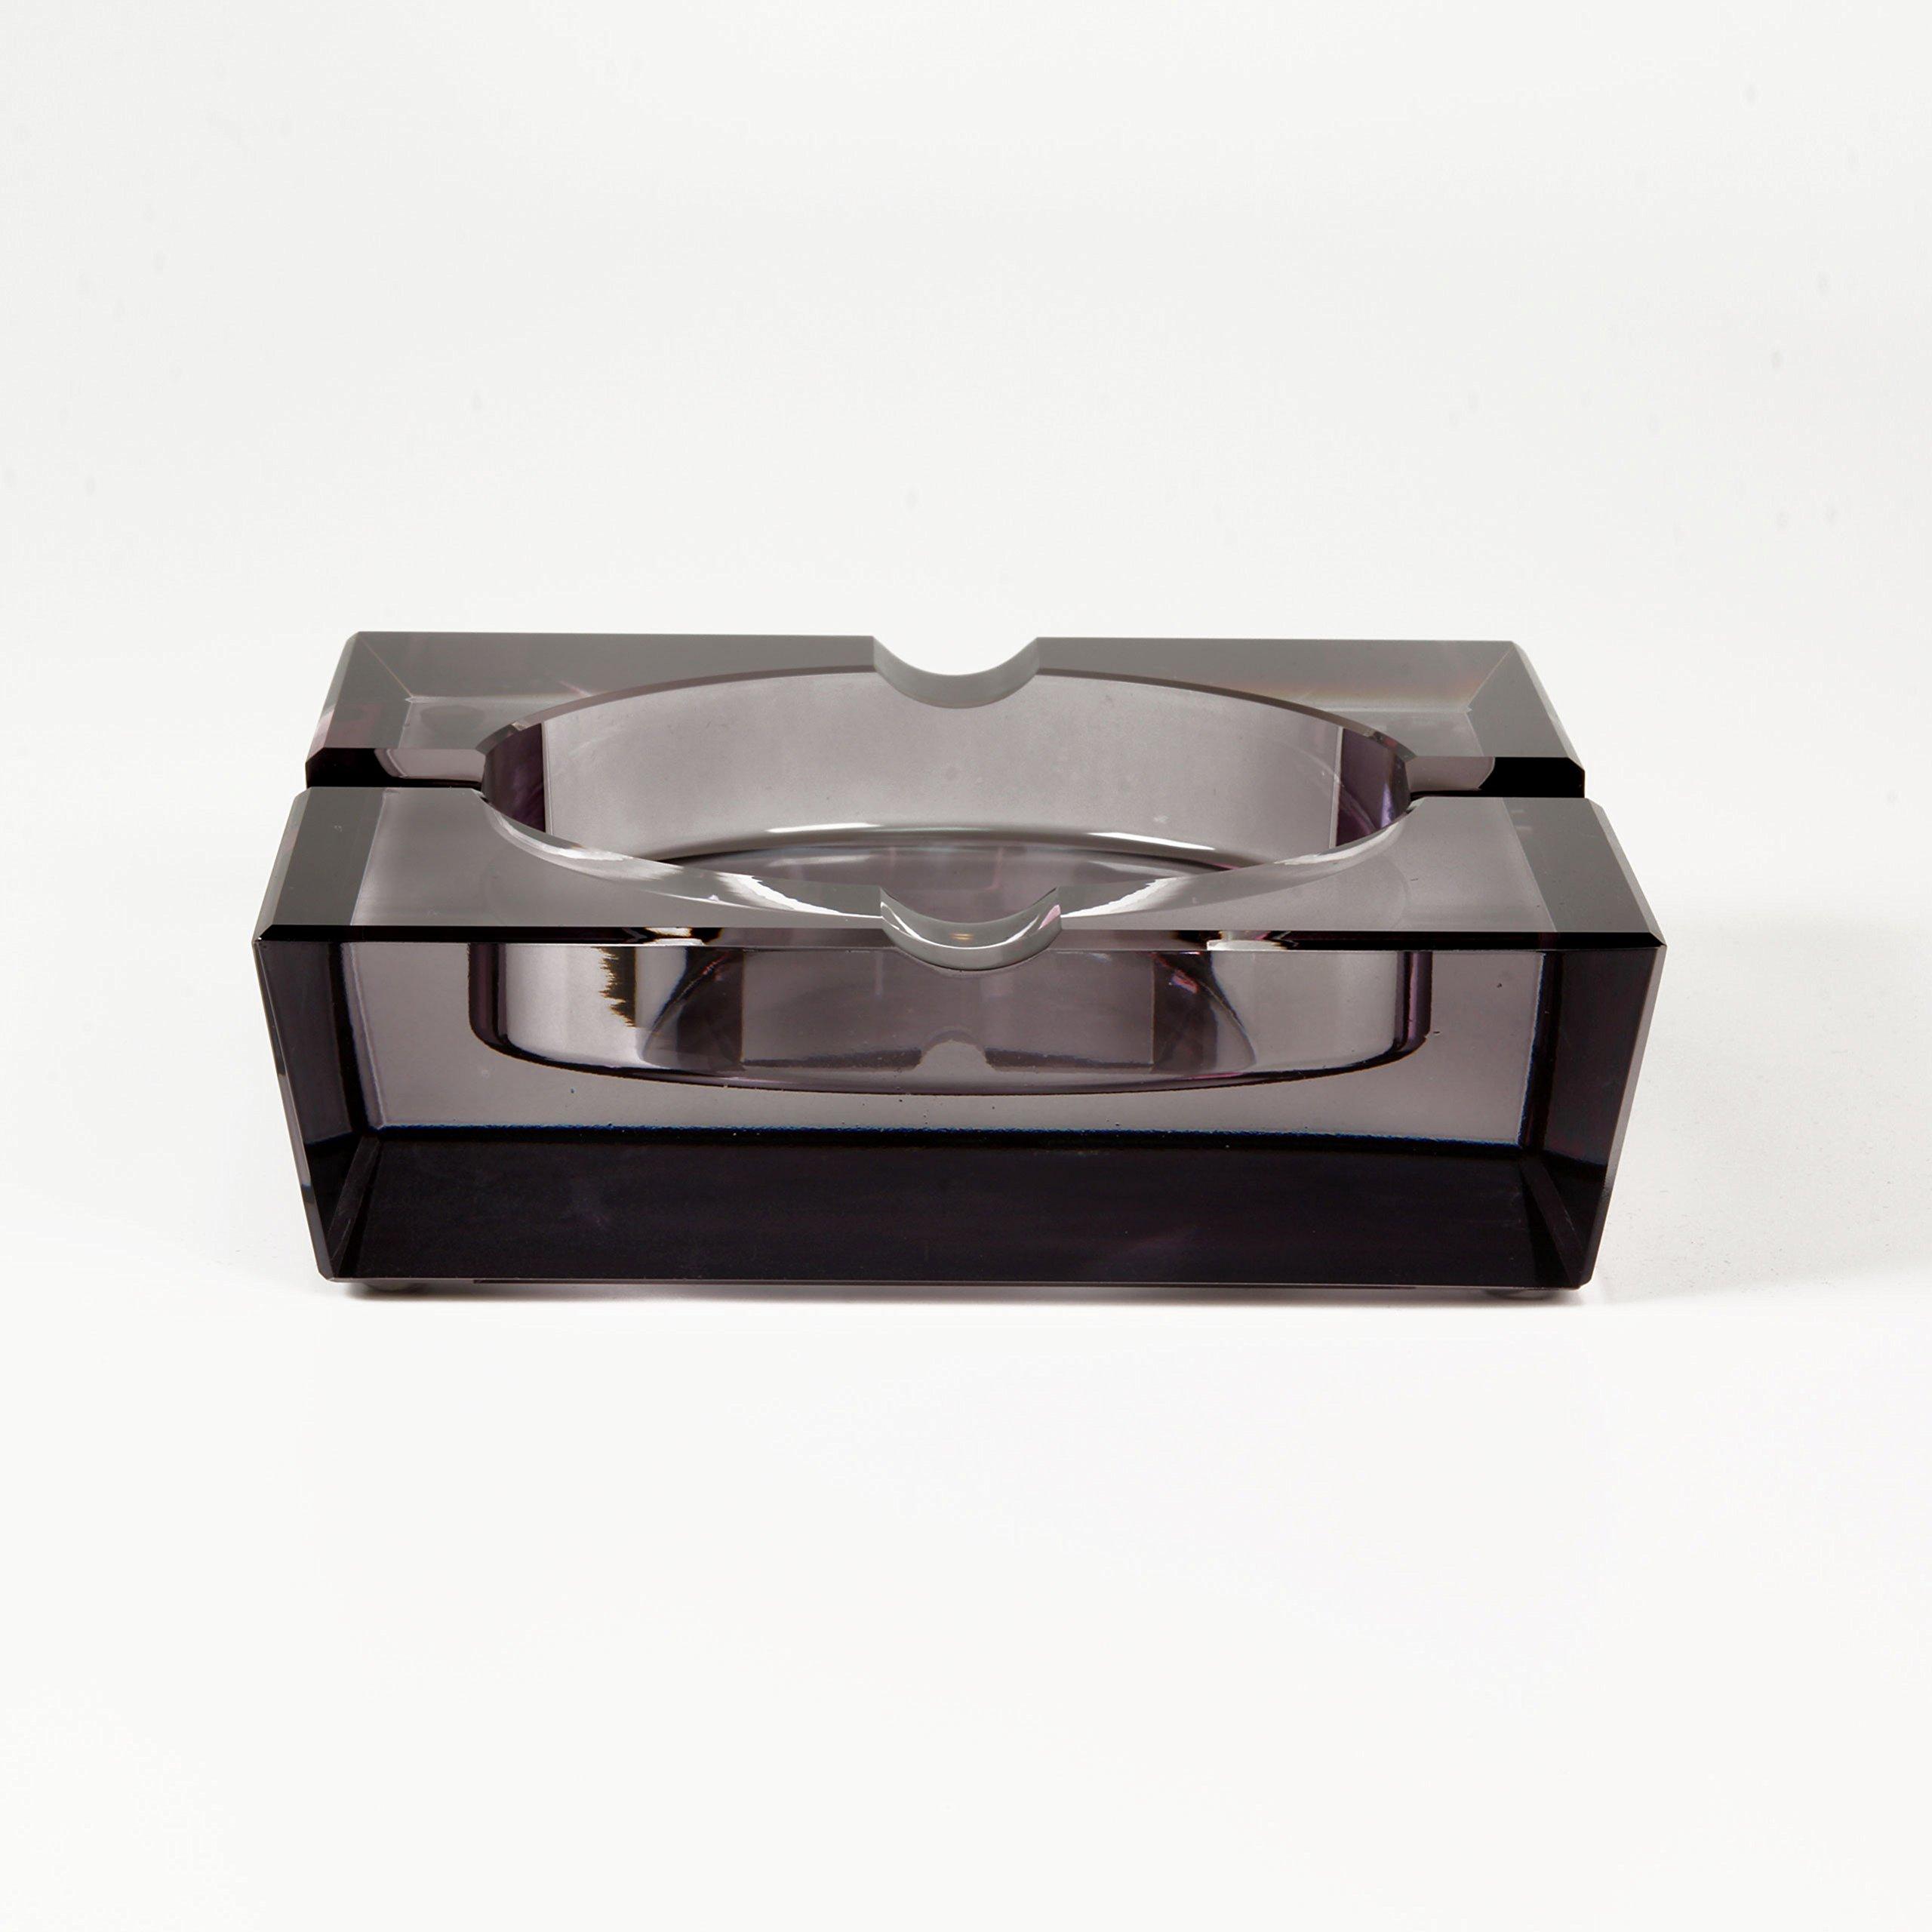 Quality Importers Ashtray 4 Cigar Crystal Ashtray, Opaque Black